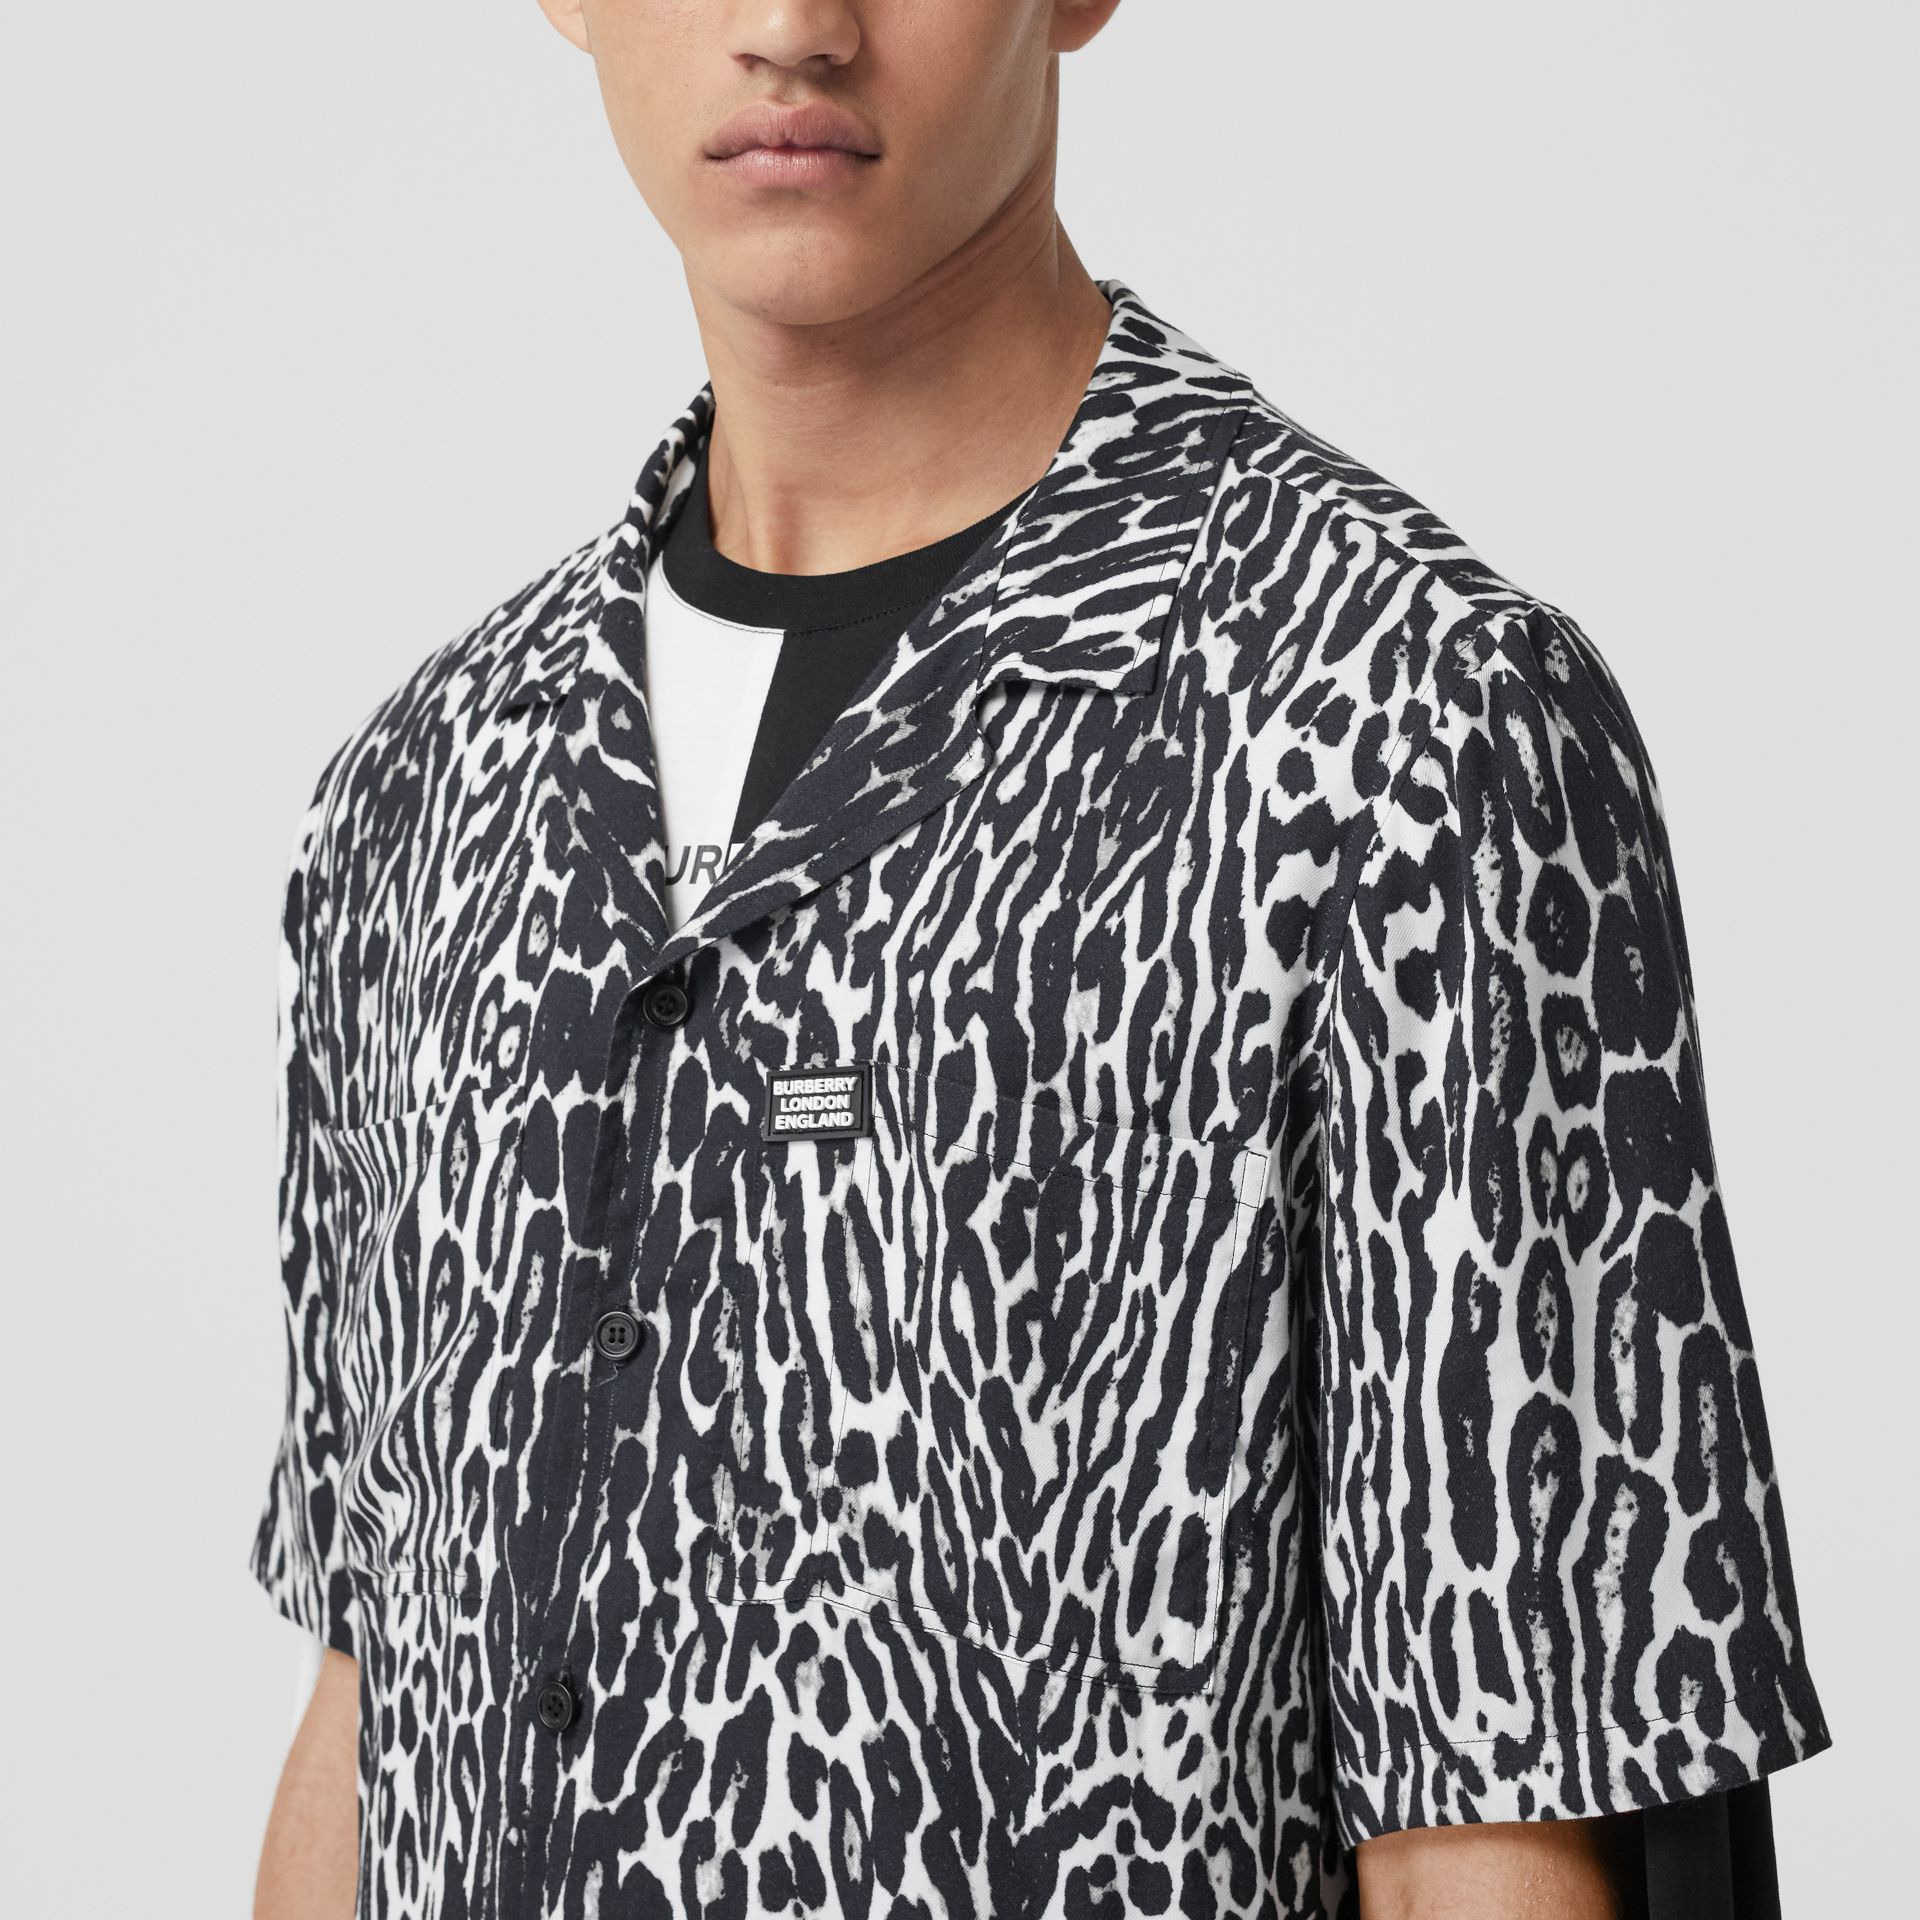 Short-sleeve Leopard Print Twill Shirt in Black - Men | Burberry United Kingdom - gallery image 1